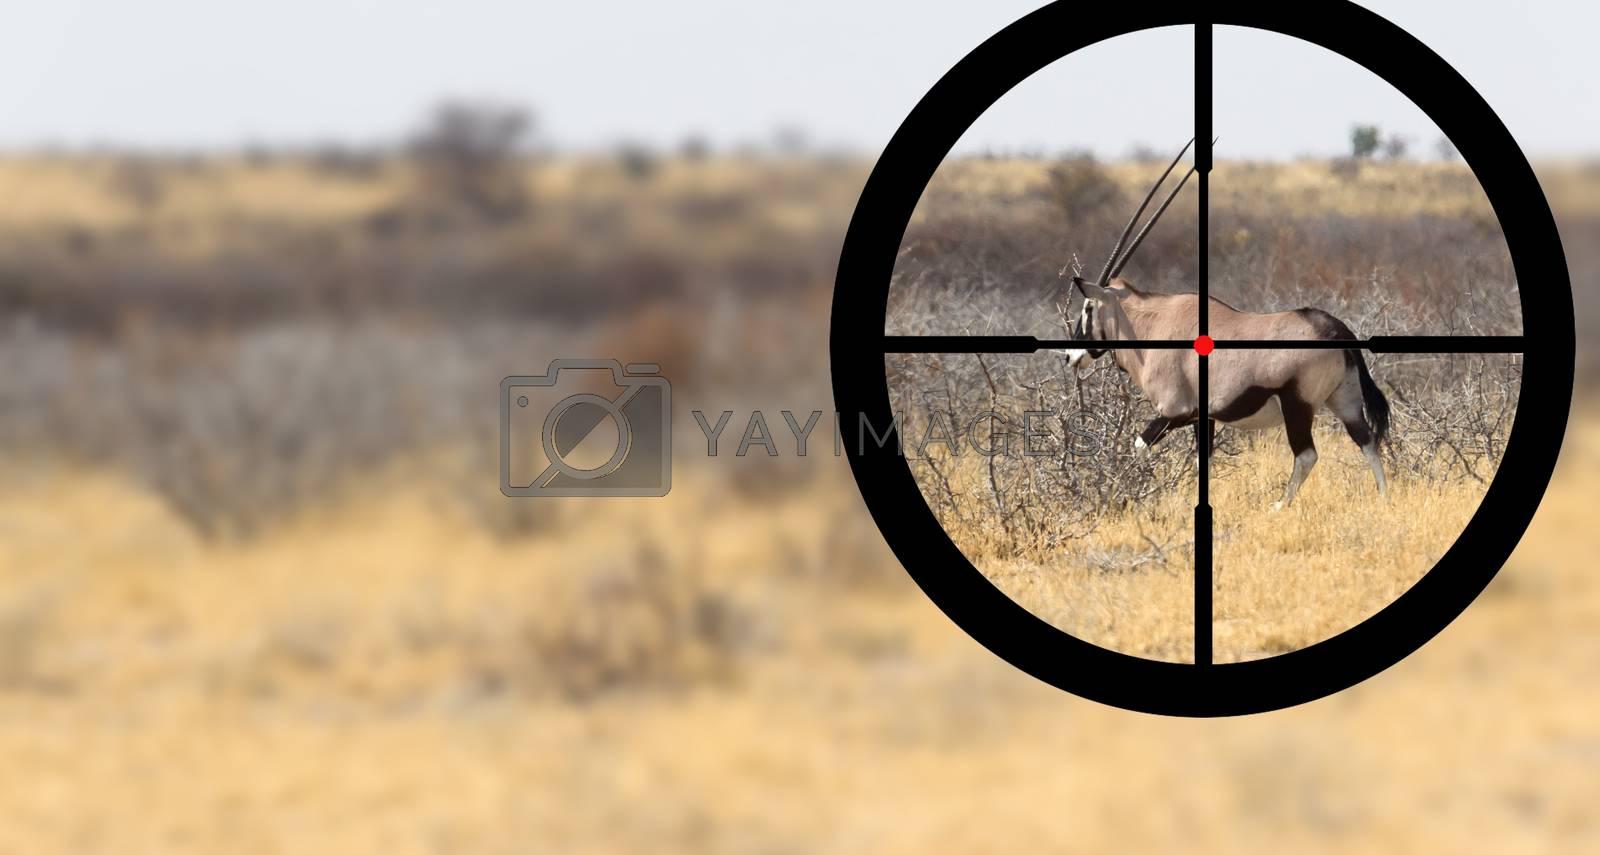 Hunting an oryx in the Kalahari desert by michaklootwijk